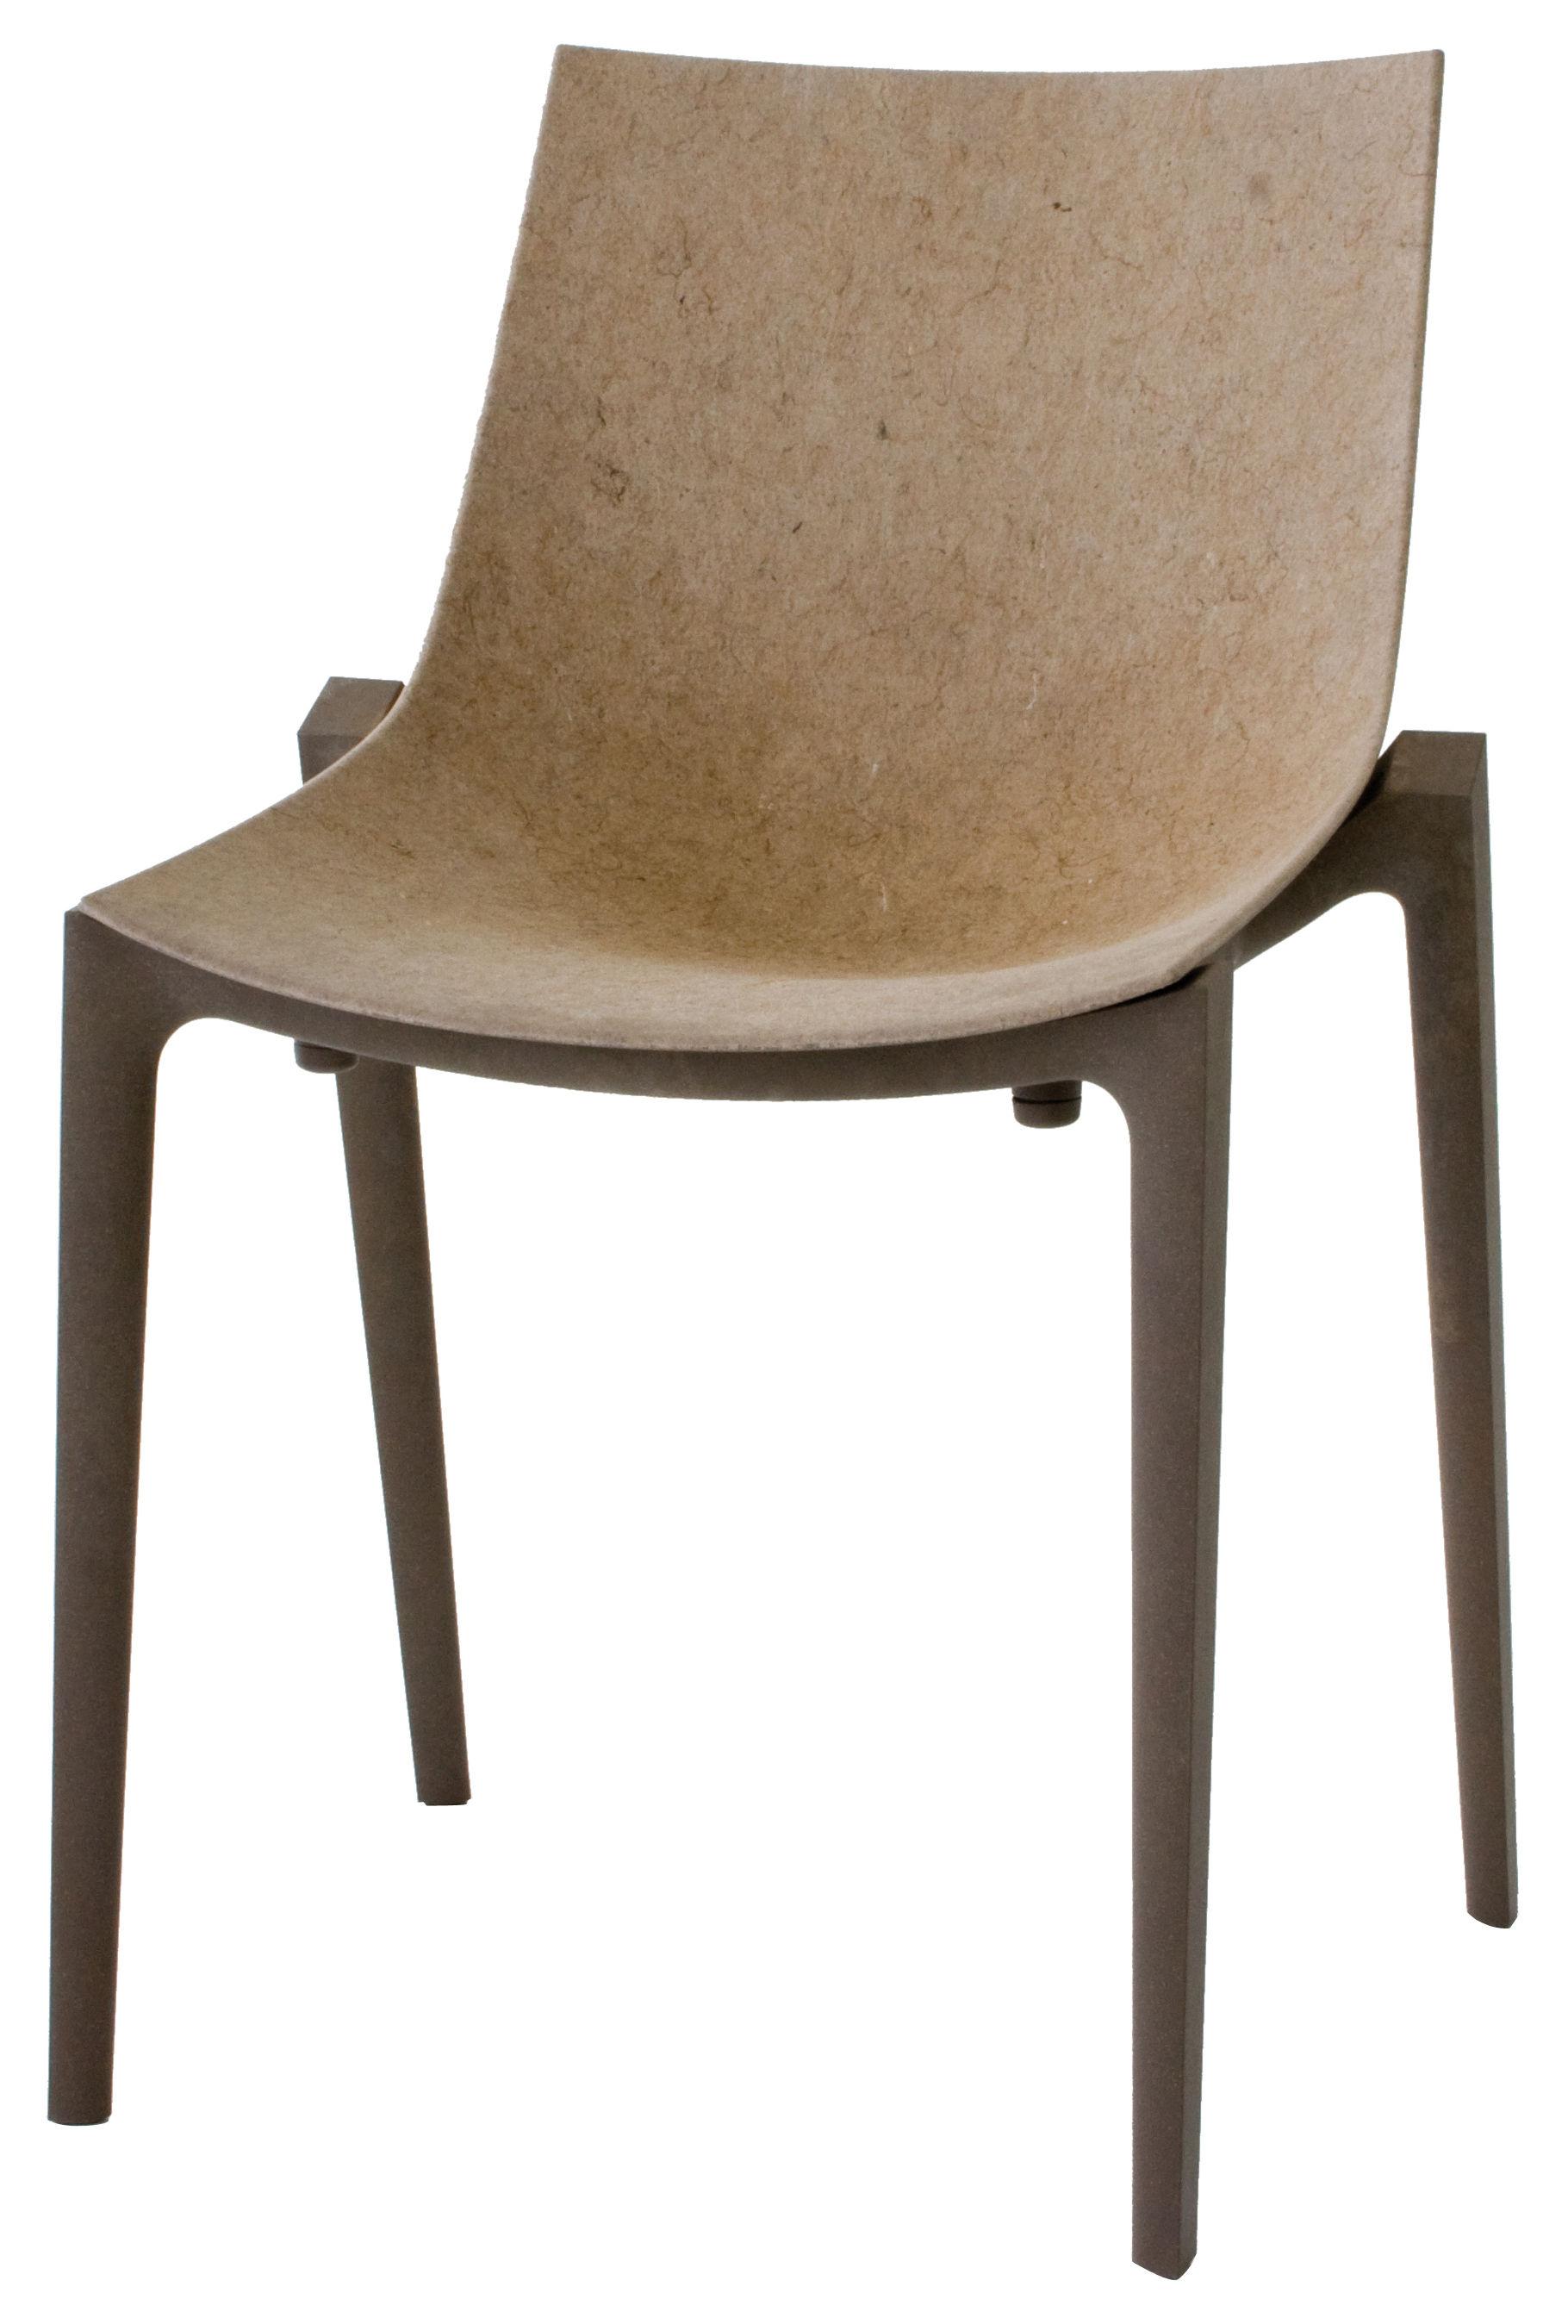 Möbel - Zartan Eco Stapelbarer Stuhl / Version aus Jutefaser - Magis - Jutefaser / beige - Fibre de jute, Polypropylène recyclé